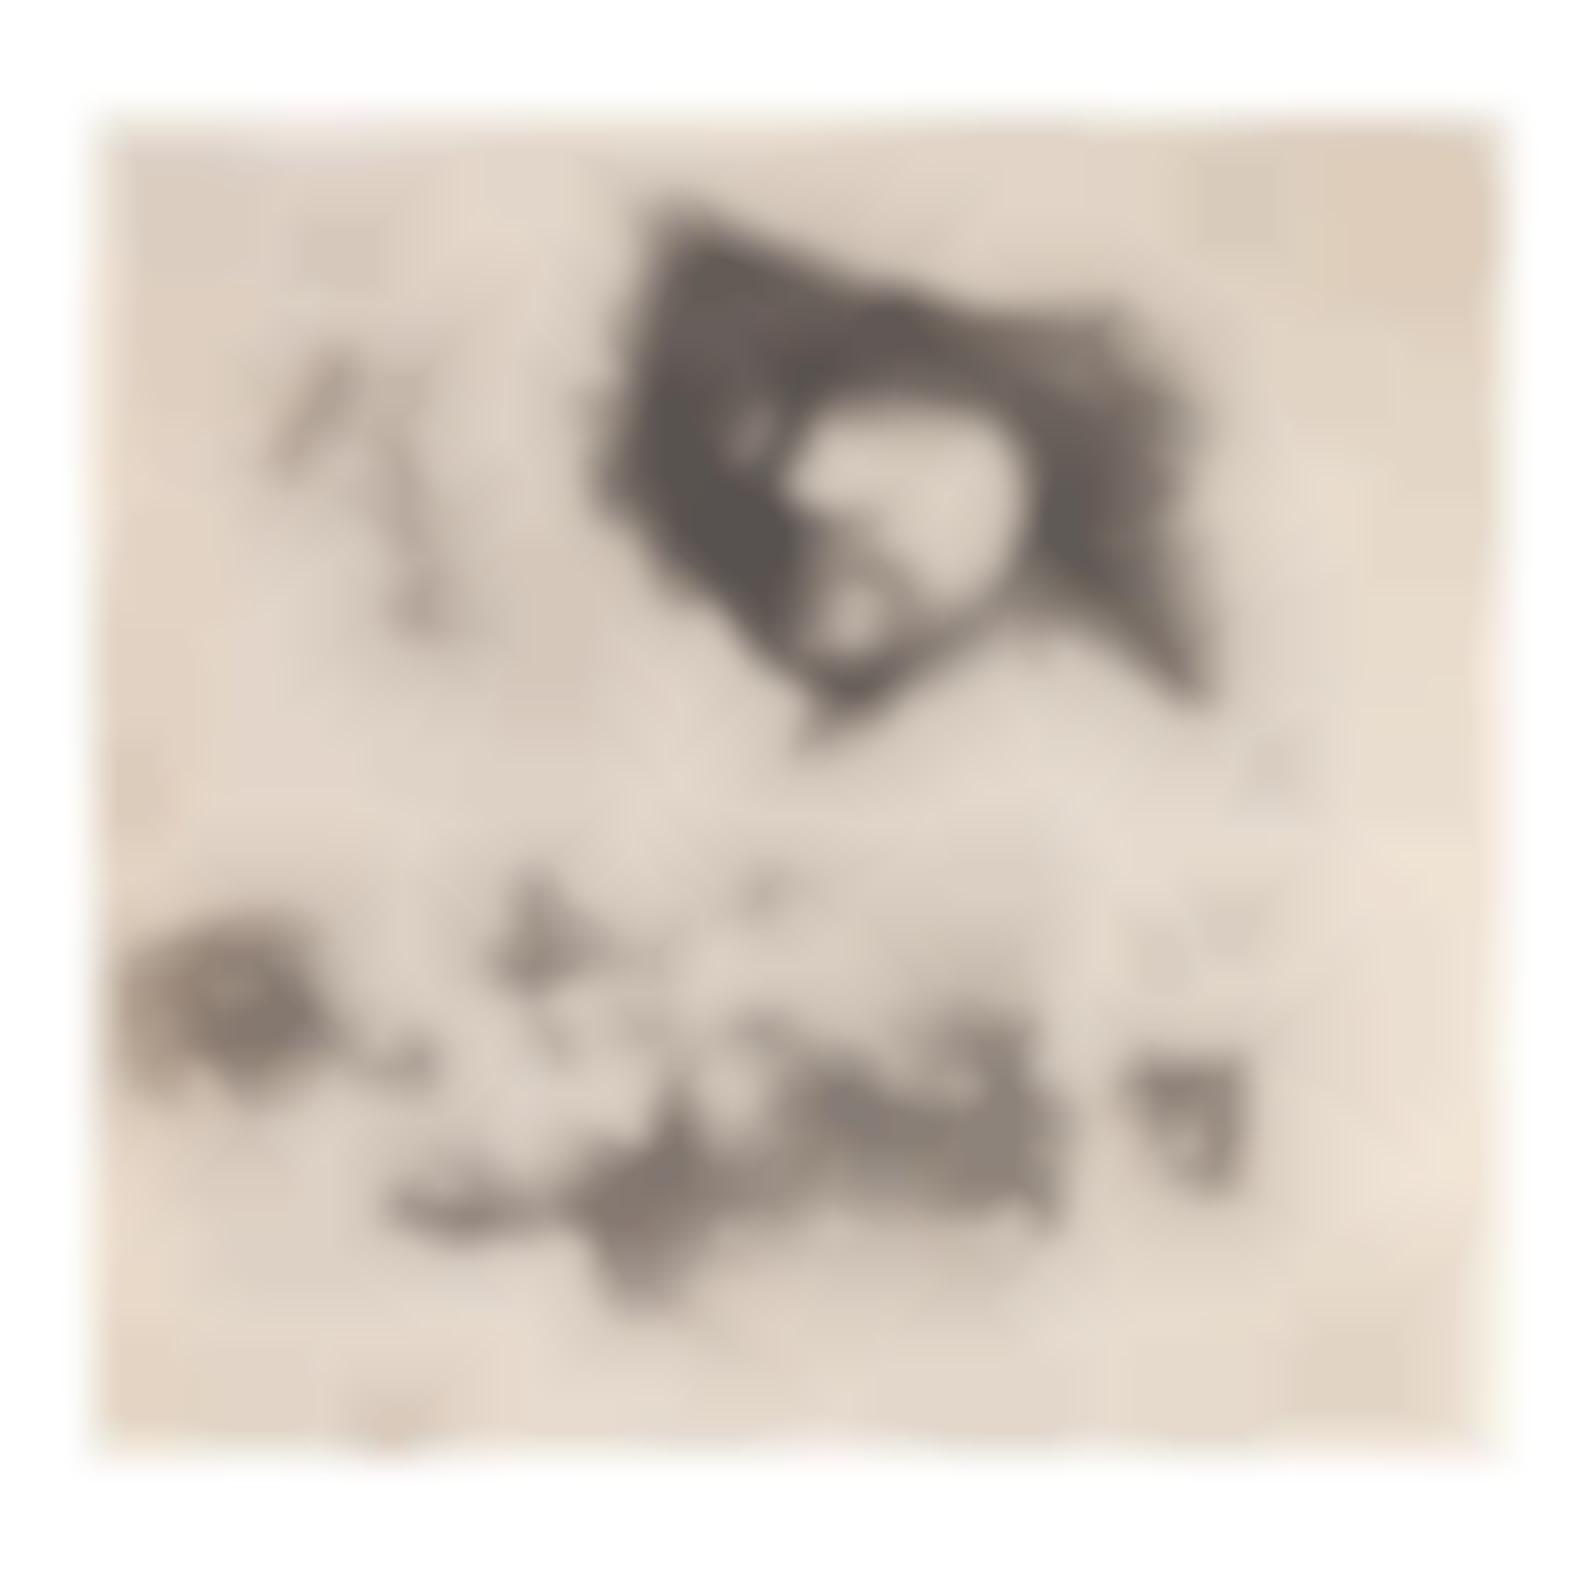 Rembrandt van Rijn-Sheet Of Studies: Head Of The Artist, A Beggar Couple, Heads Of An Old Man And Old Woman (Bartsch 363; New Hollstein 115)-1632